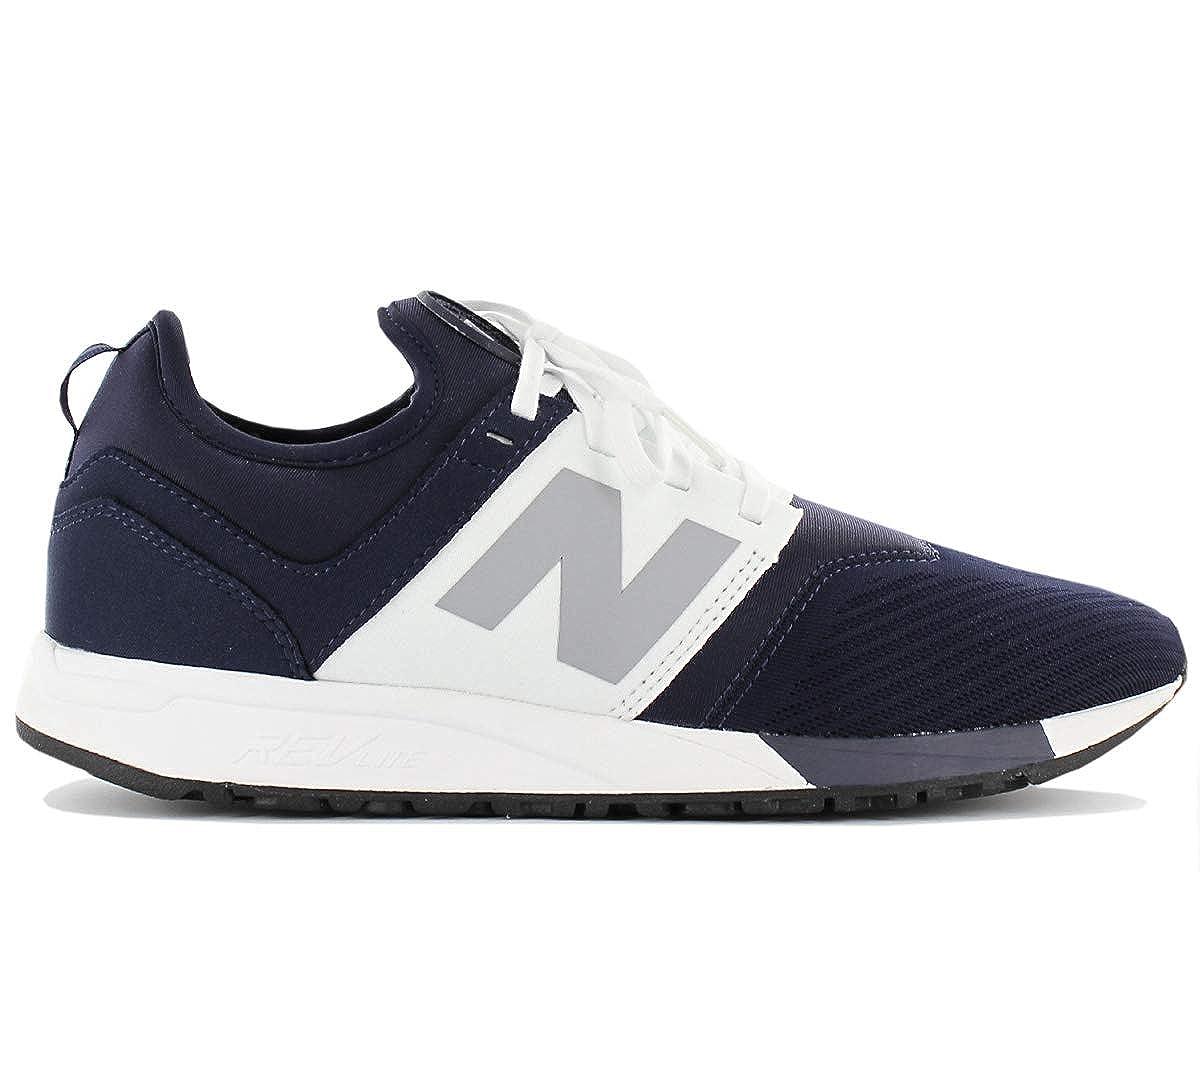 New Balance Lifestyle MRL247TF Herren Schuhe Blau - Grösse    EU 46.5 US 12 339508